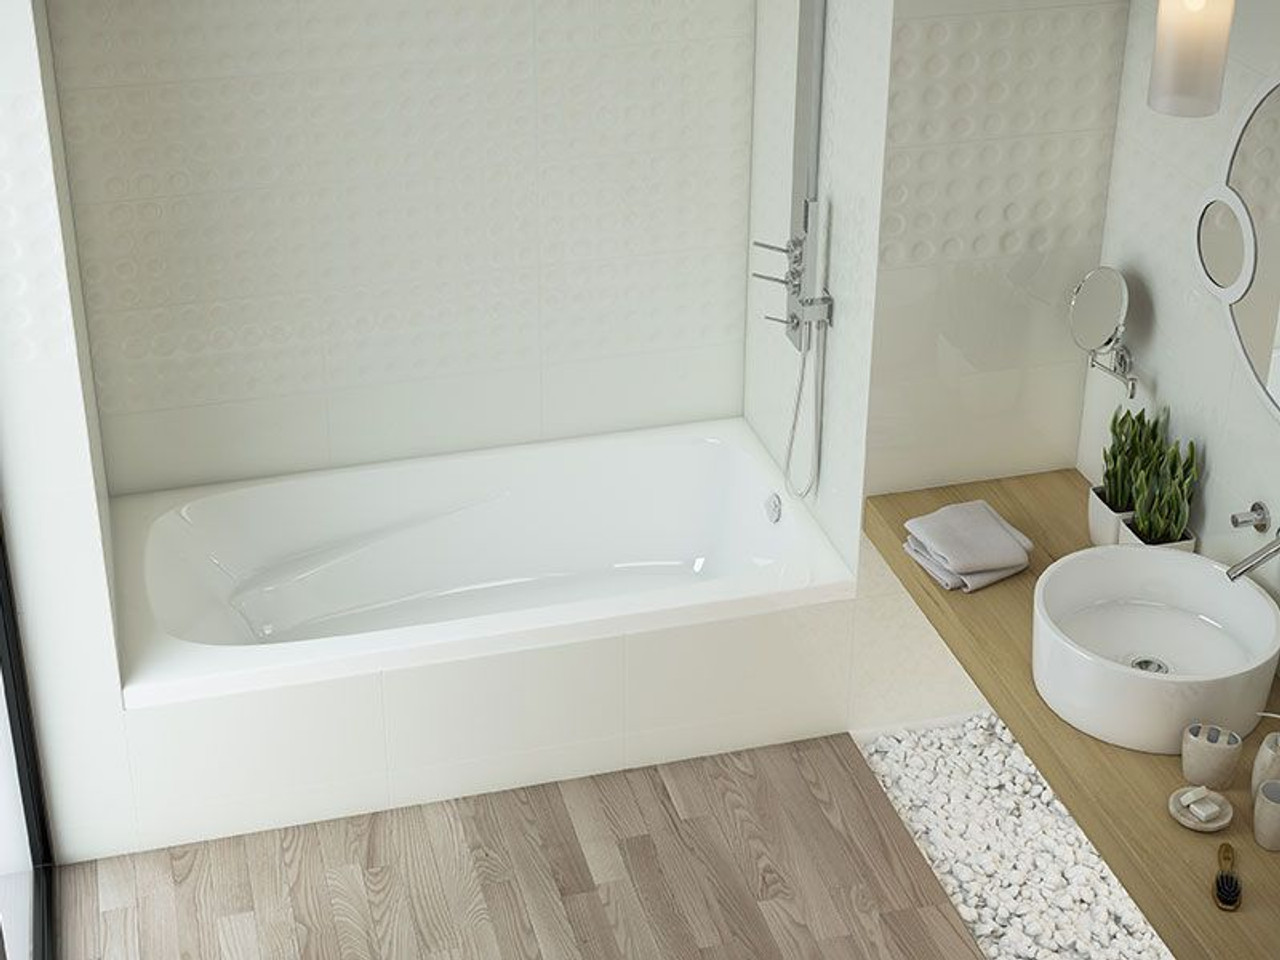 "mirolin gryphon 3 alcove bath tub 72"" x 34"" x 20"" lh - york taps"